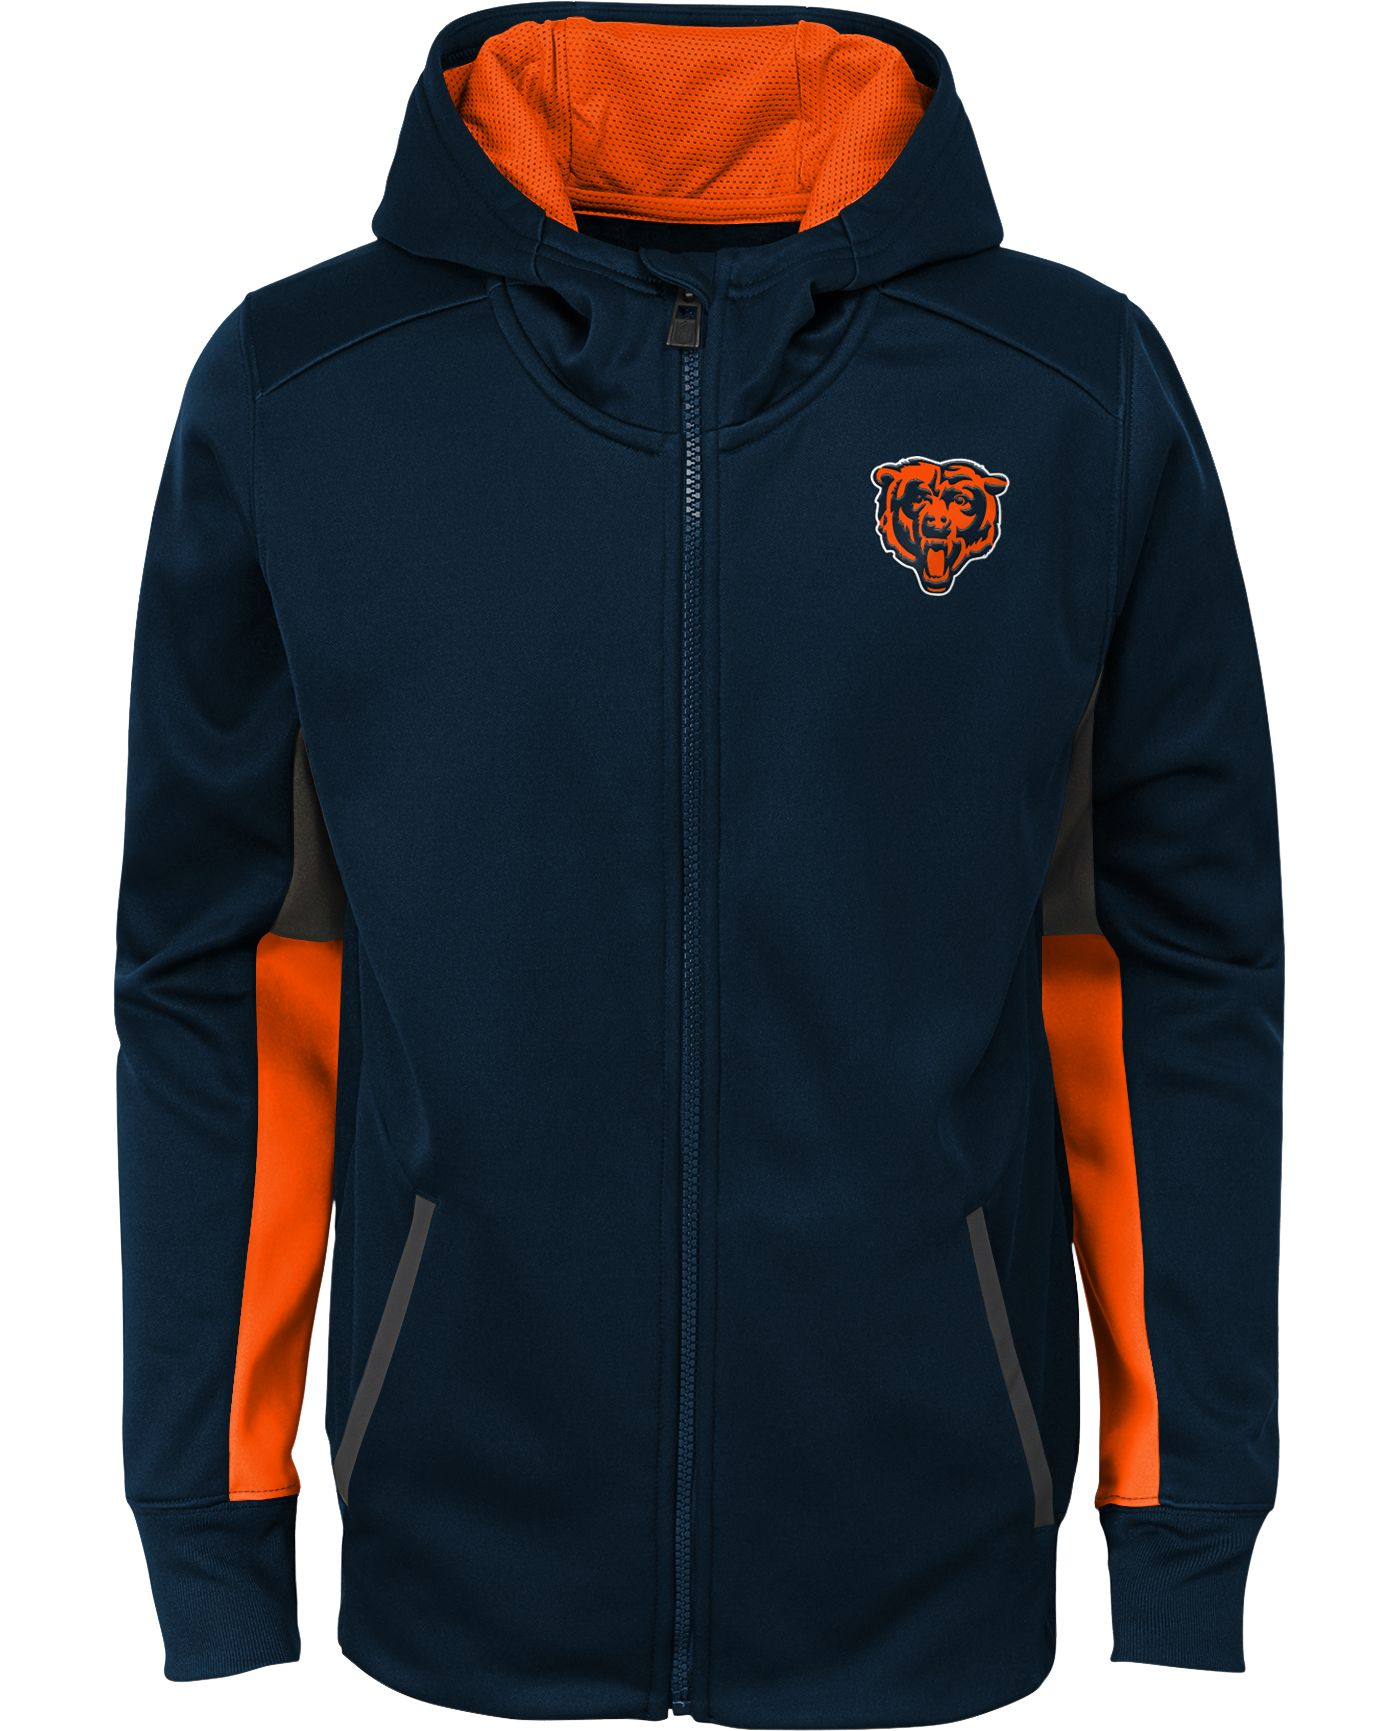 NFL Team Apparel Youth Chicago Bears Performance Navy Full-Zip Hoodie